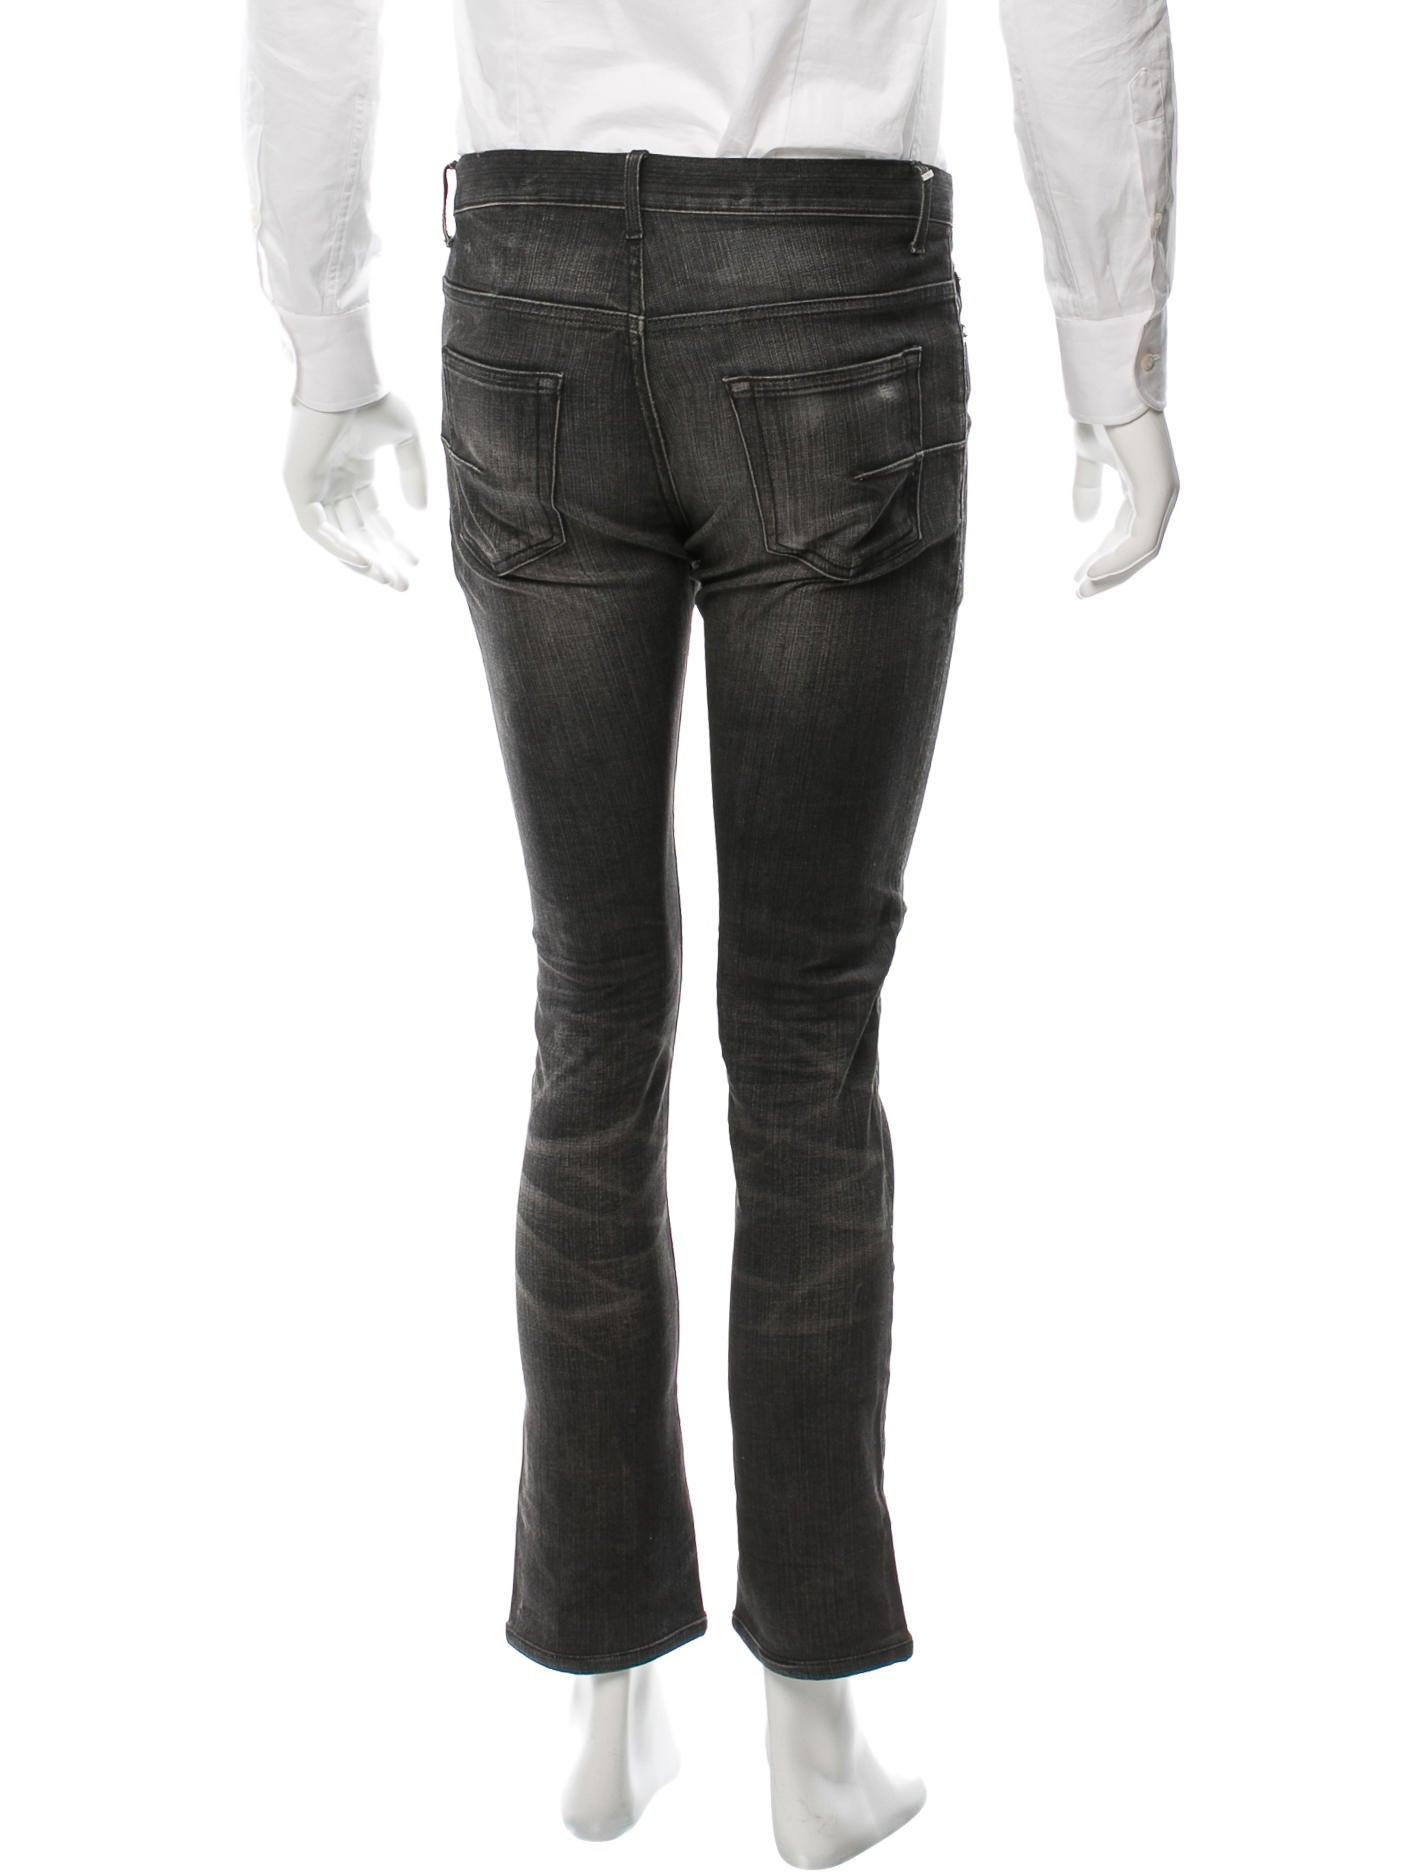 dior homme slim straight leg jeans clothing hmm22208 the realreal. Black Bedroom Furniture Sets. Home Design Ideas